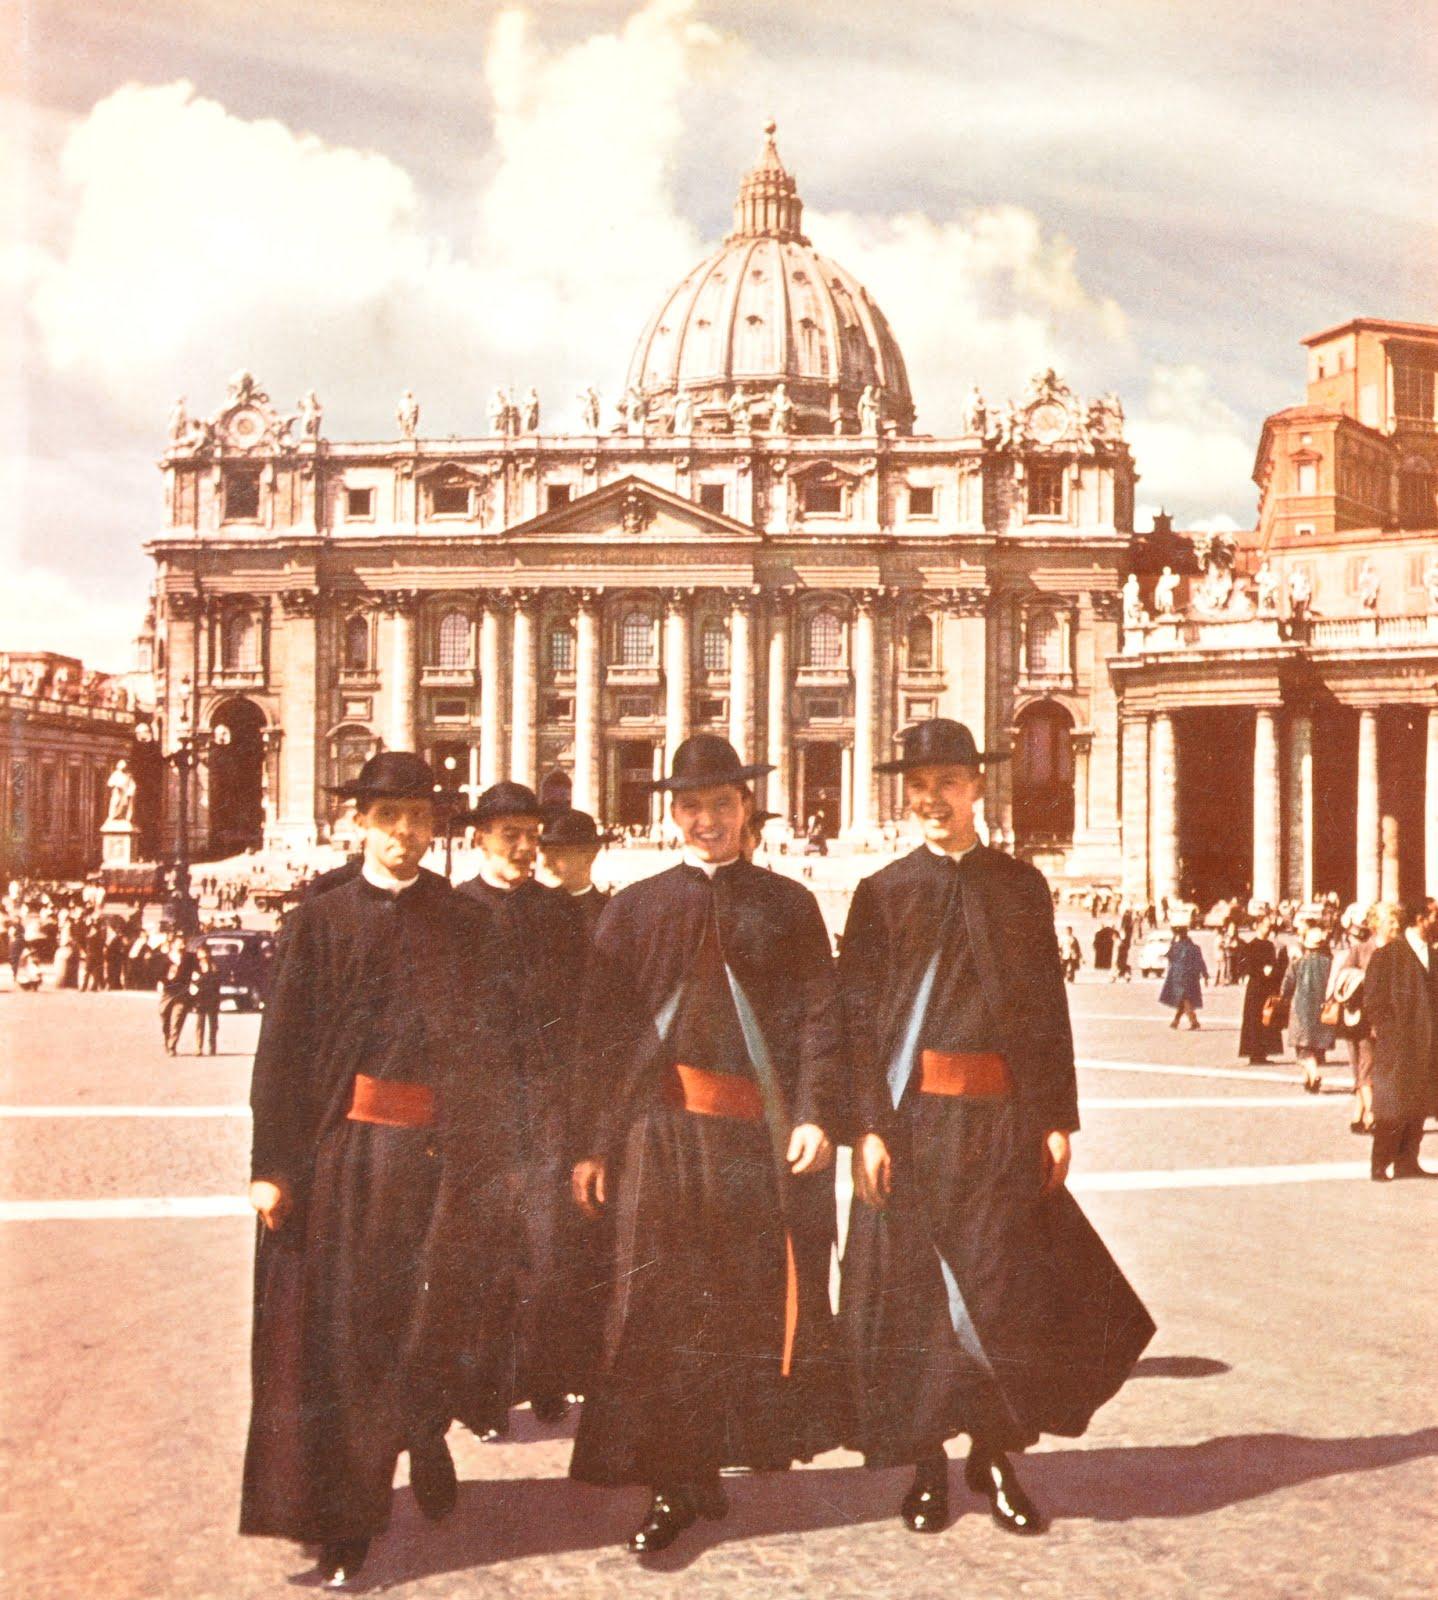 pontifical north college rome - photo#7